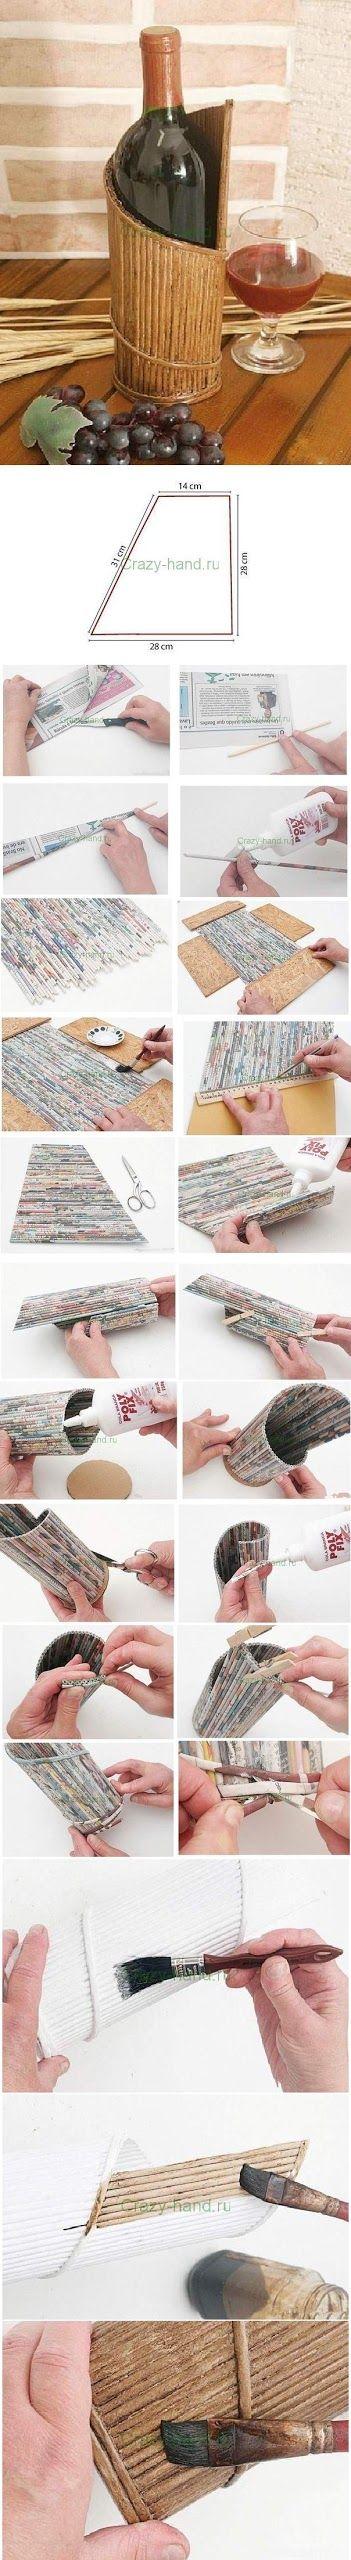 Botellero con papel de periódico reciclado (paso a paso) - Tutorial wine stand from newspaper